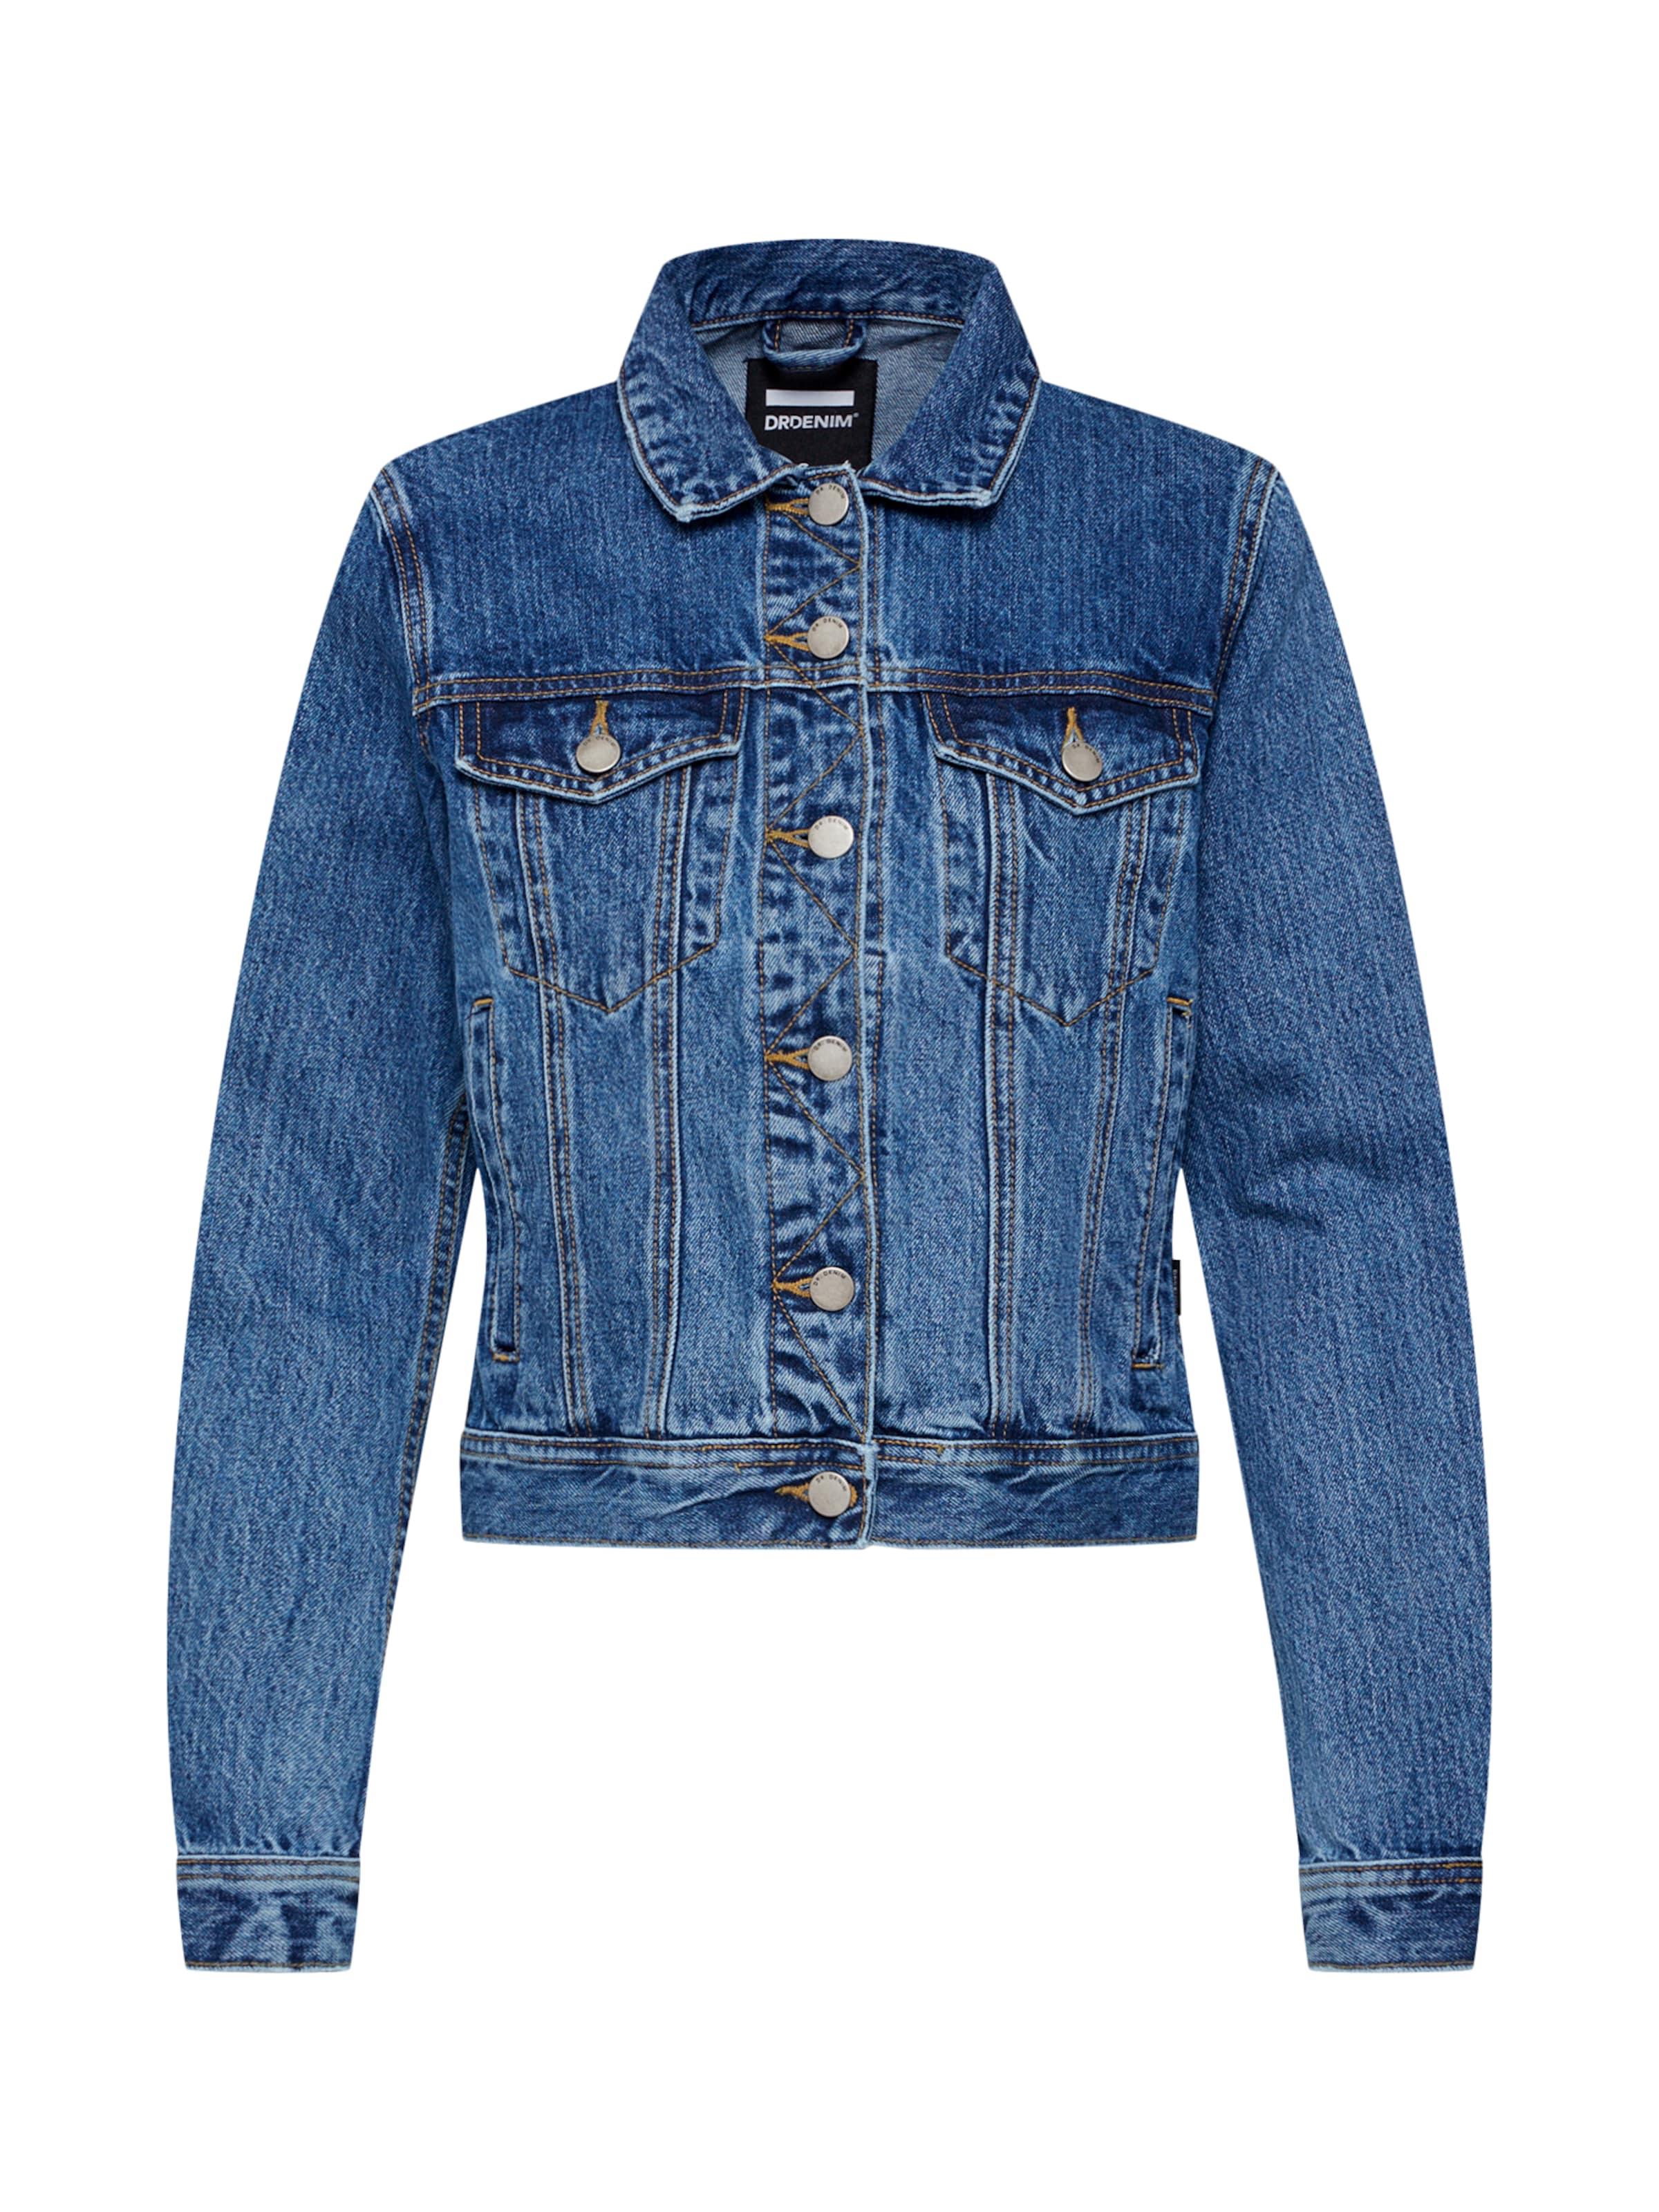 Trucker saison 'viva Jacket' In Bleu Mi DrDenimVeste wOXZiTkPu